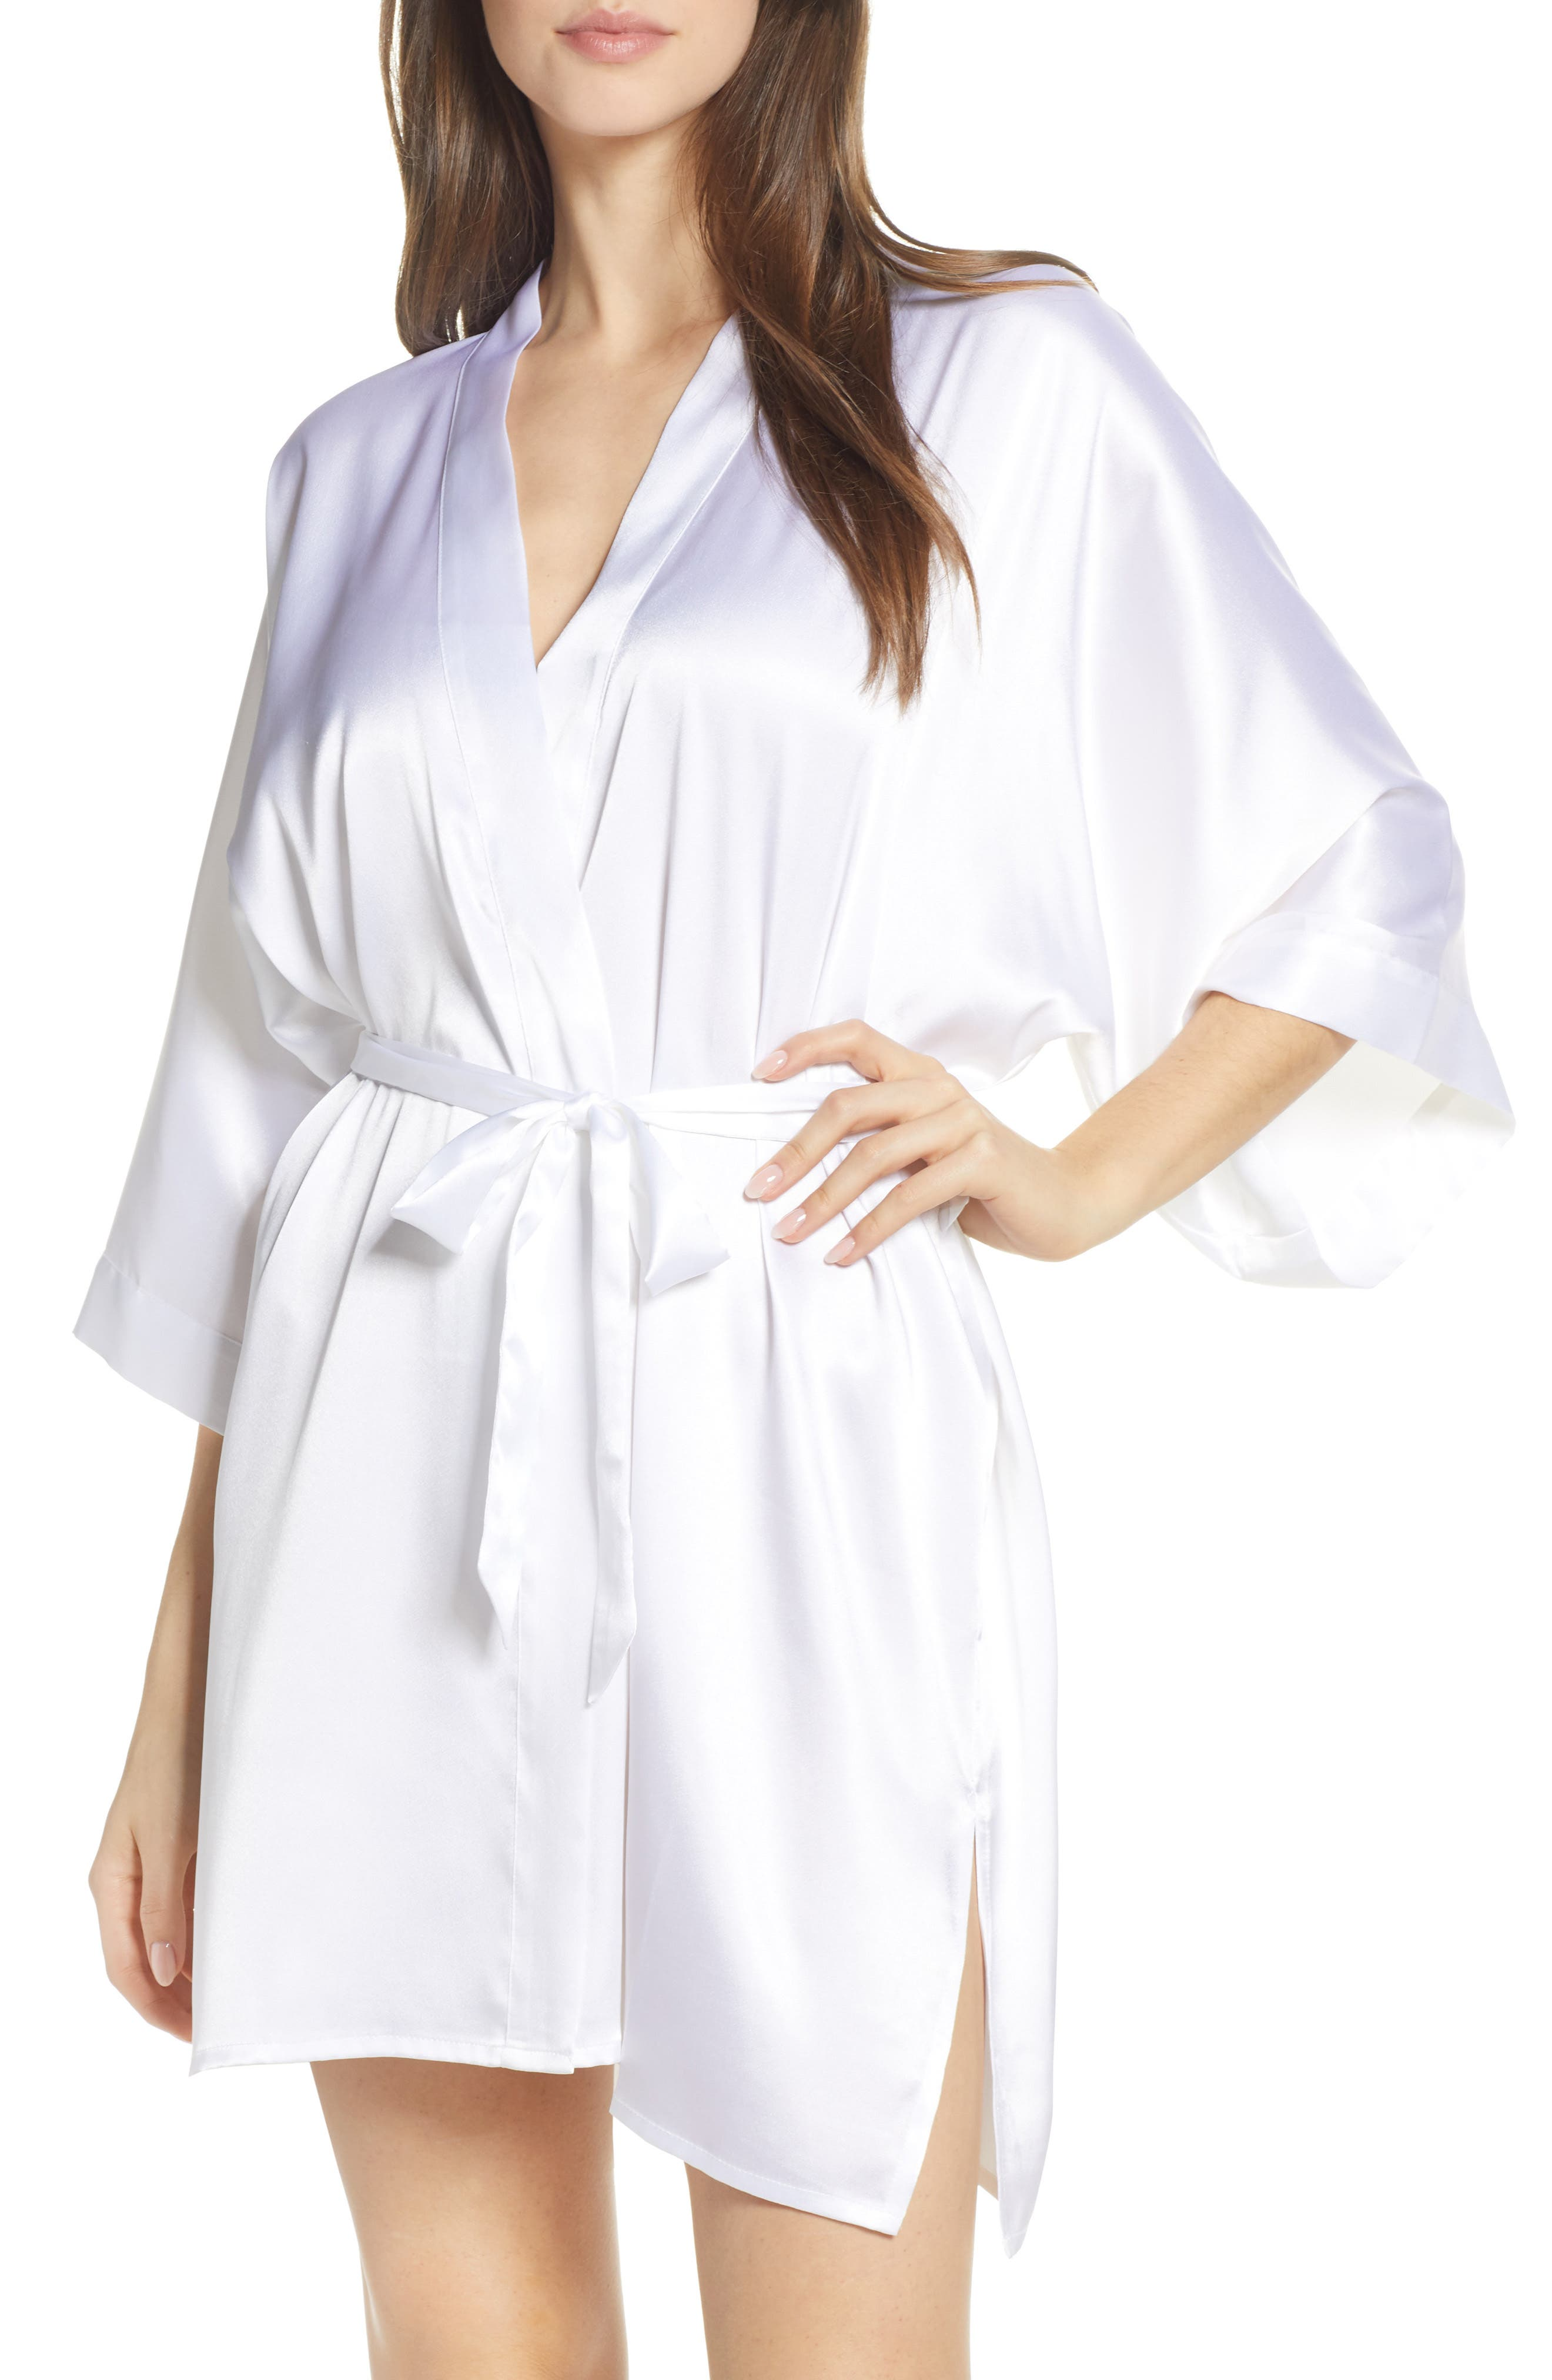 SAMANTHA CHANG Kimono Robe, Main, color, WHITE